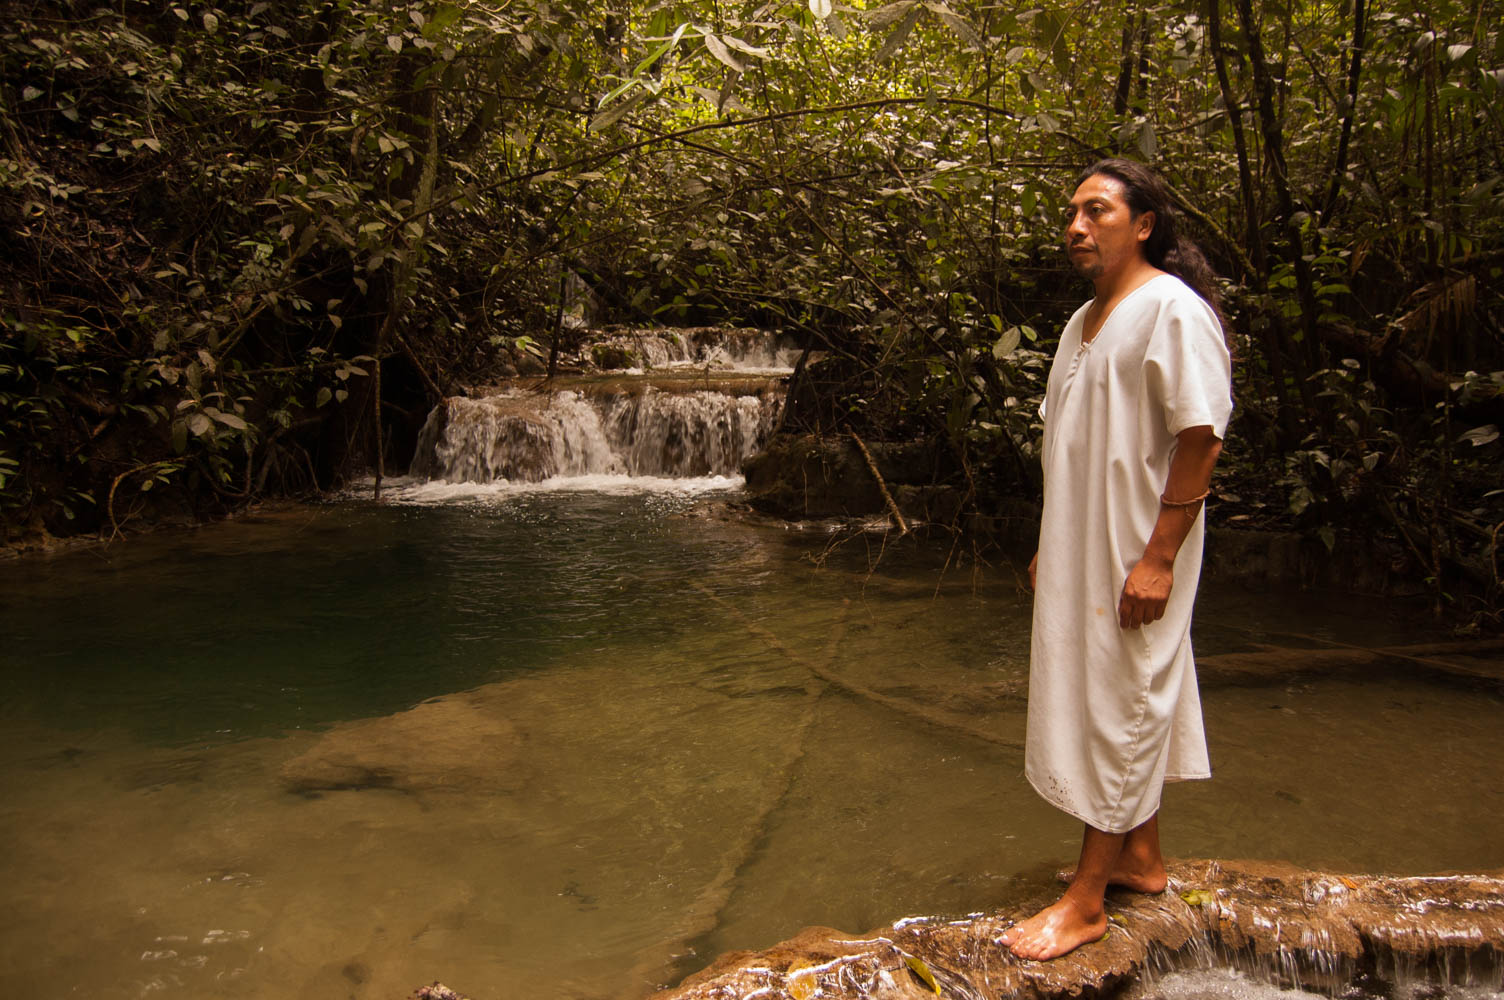 tours_en_chiapas_turismo_de_aventura_mayas_lacandones_selva_lacandona_cascada_del_corcho_negro_daniel_chankin